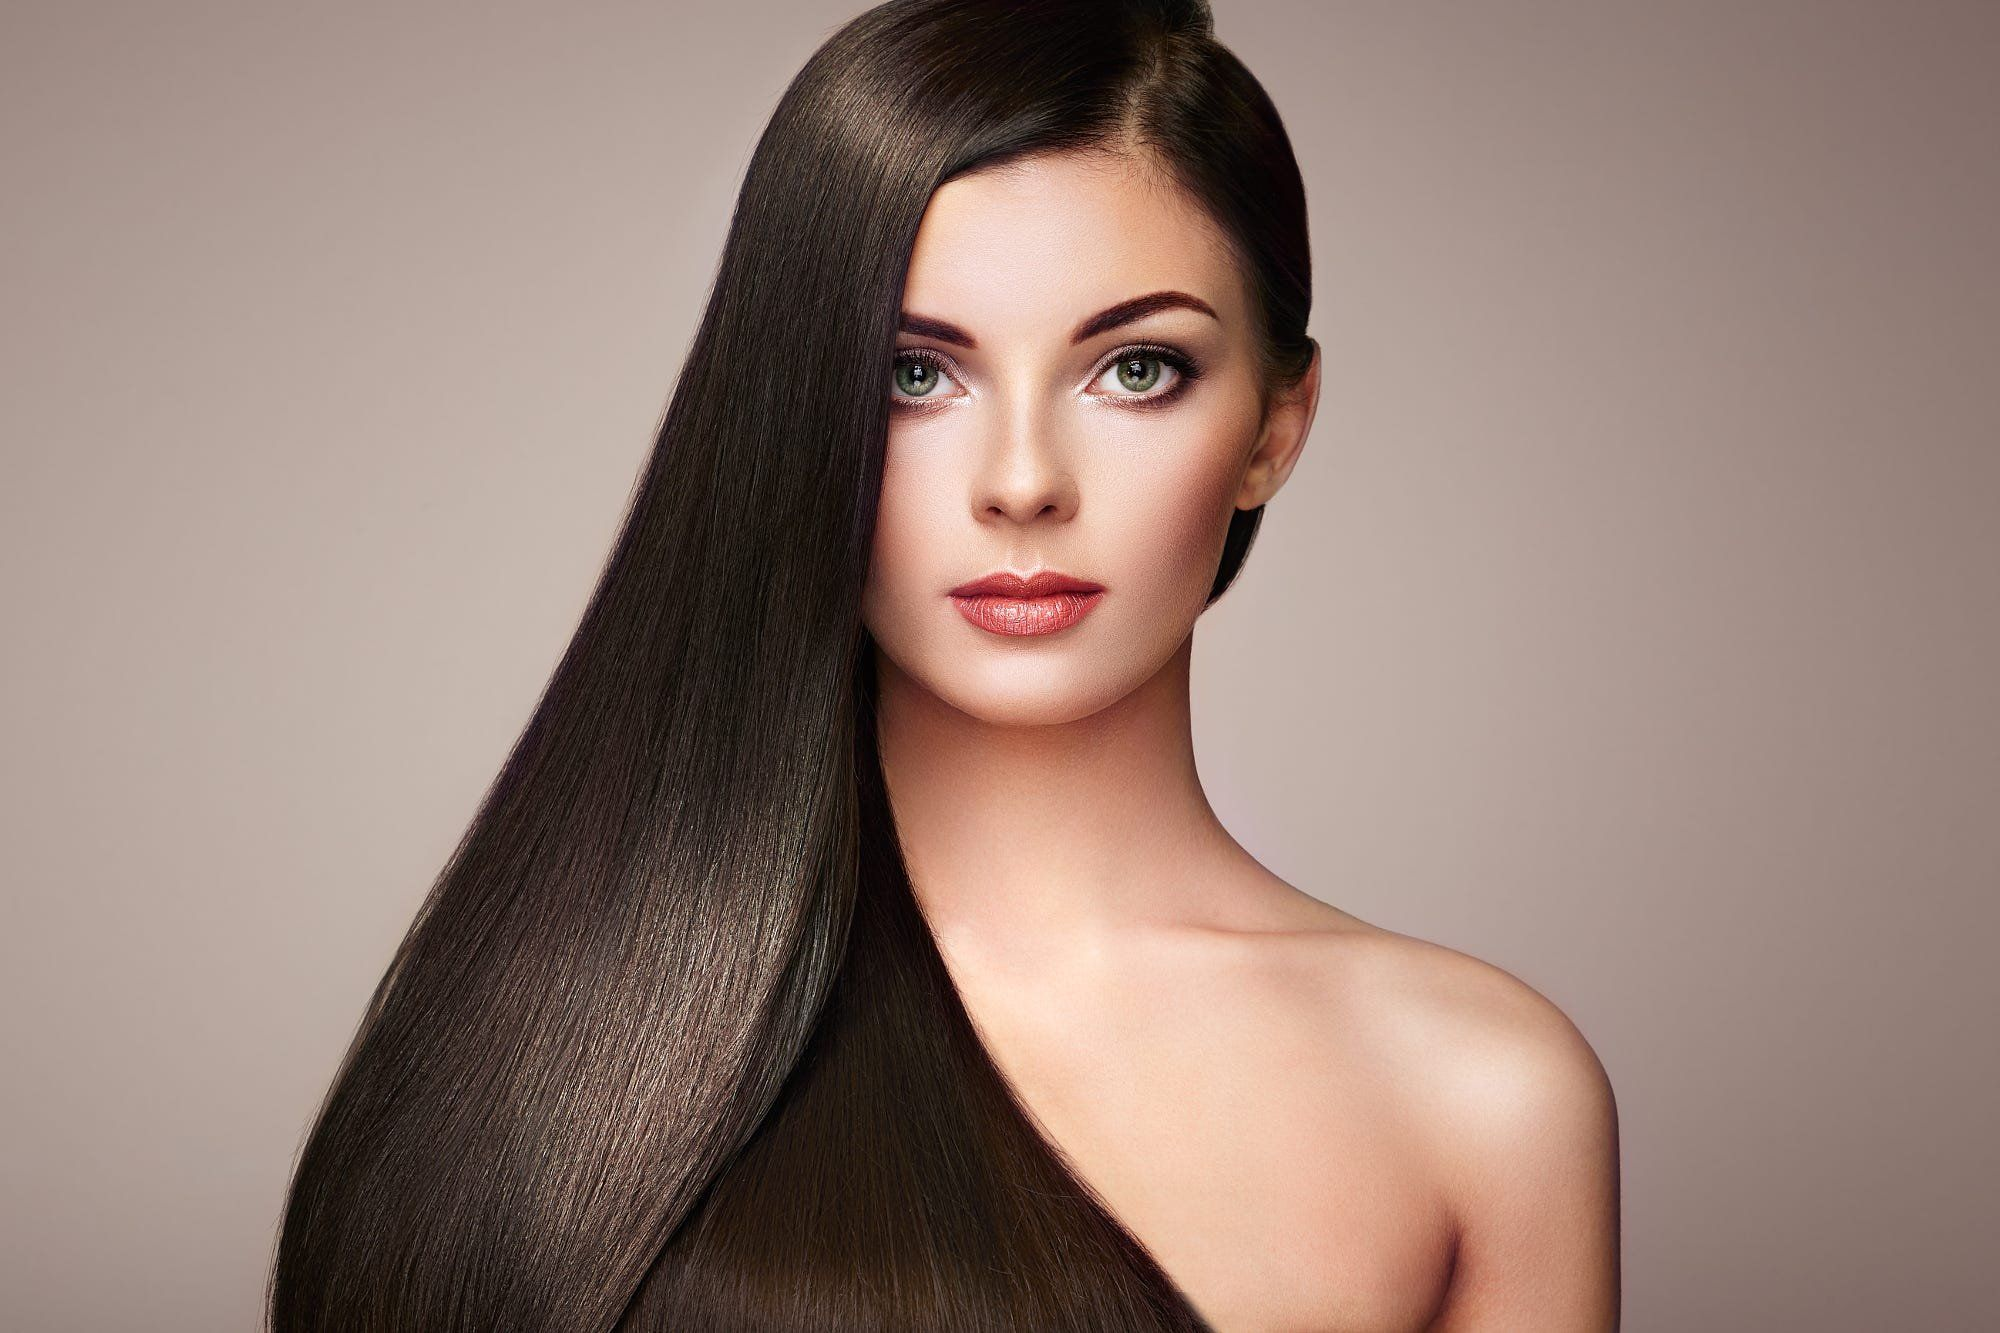 Shampoo for Low Porosity Hair